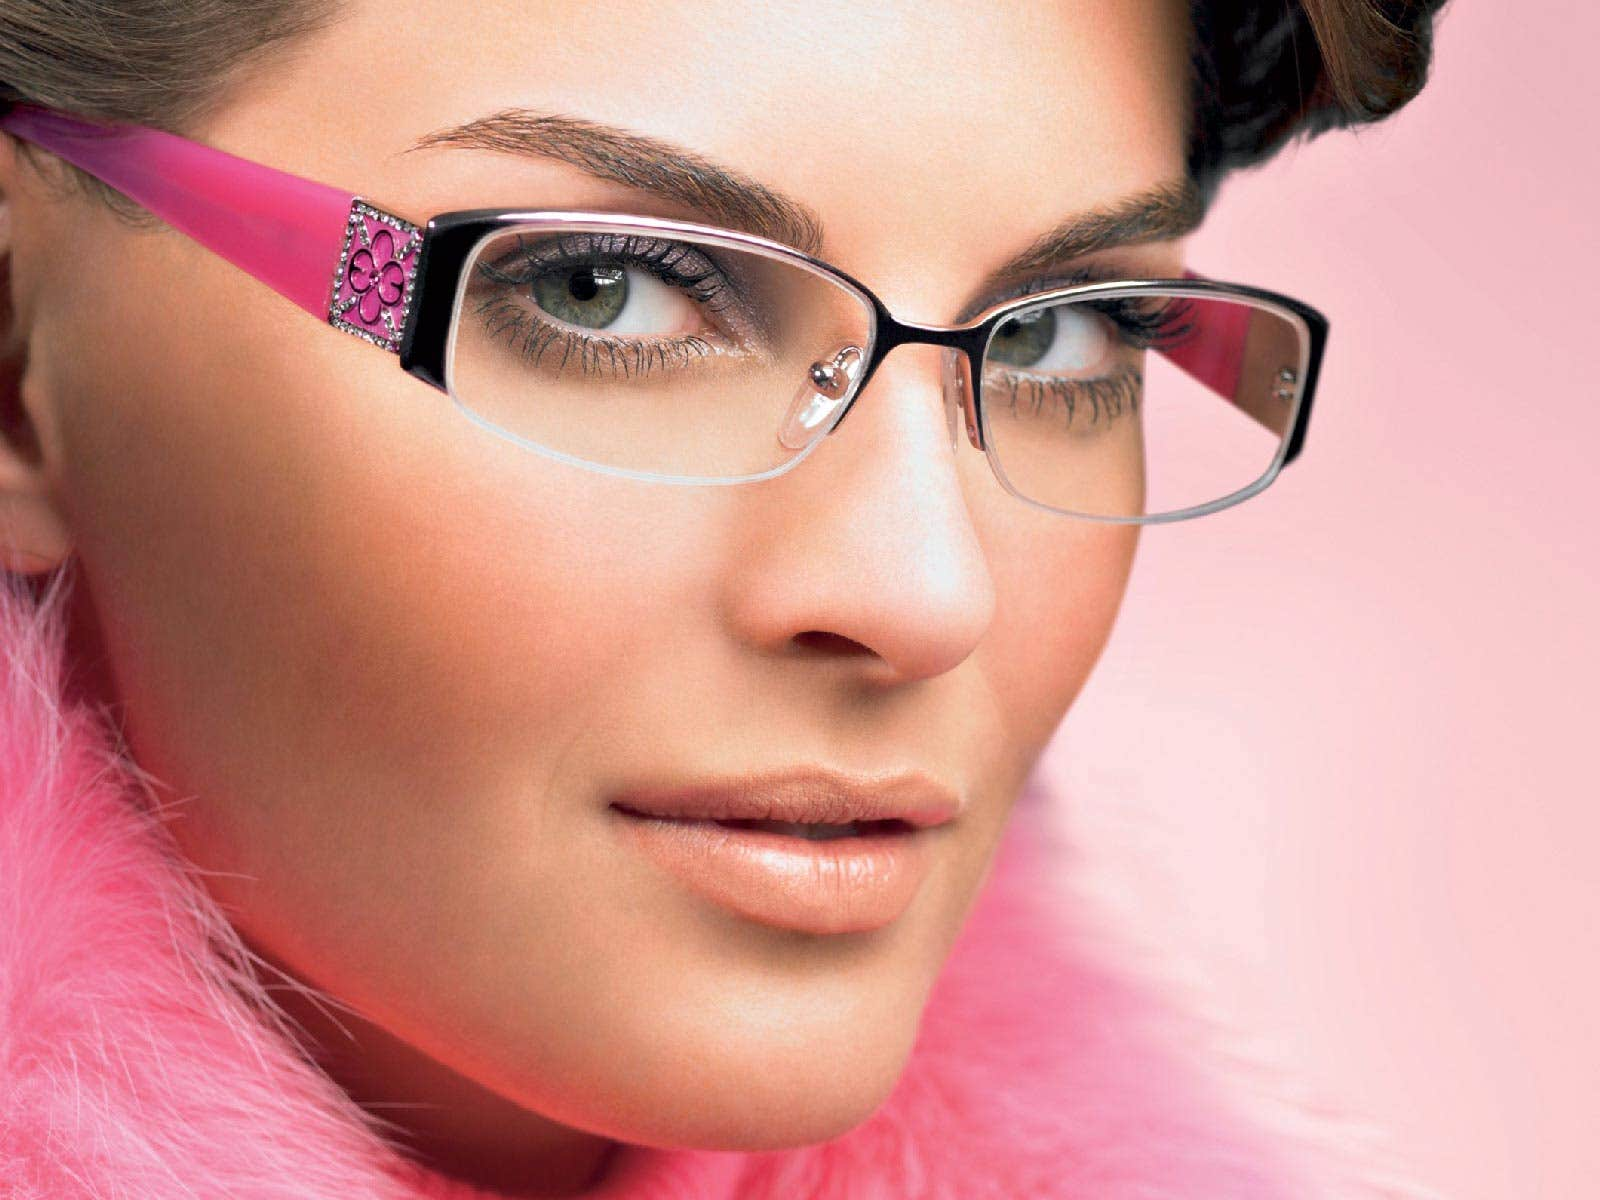 Eyeglasses and Make-up